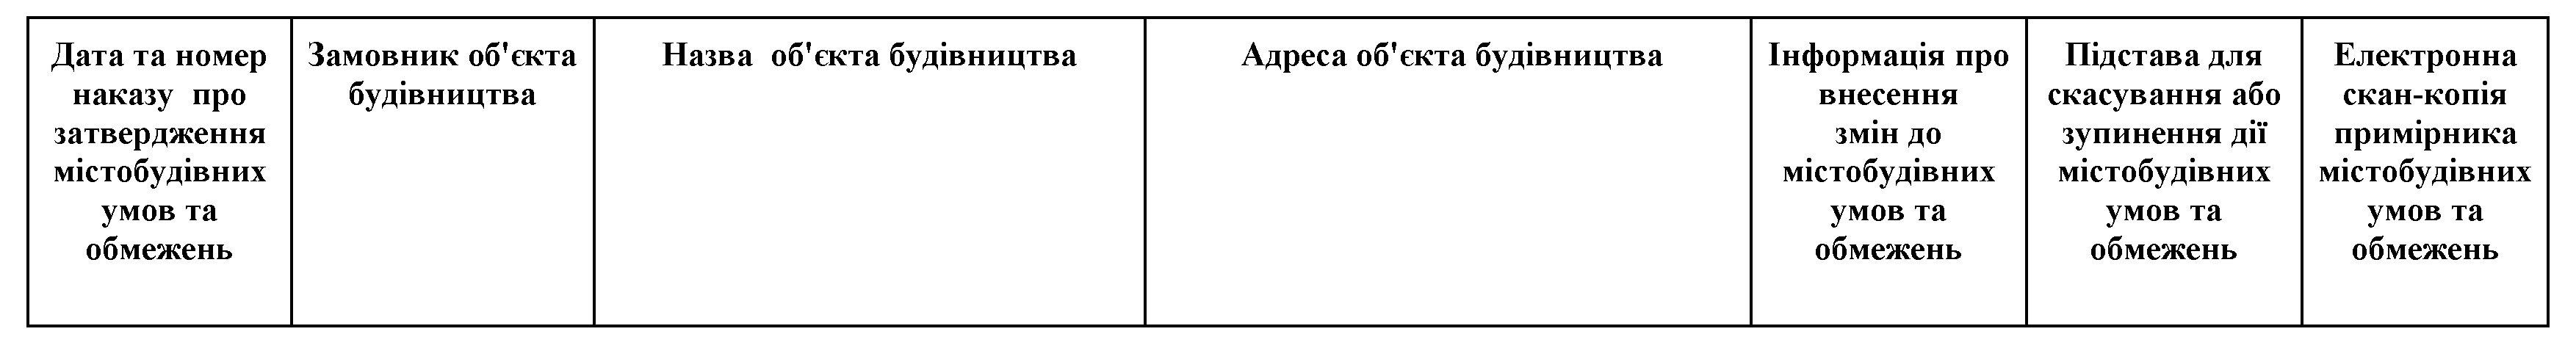 91111111111111111111111111